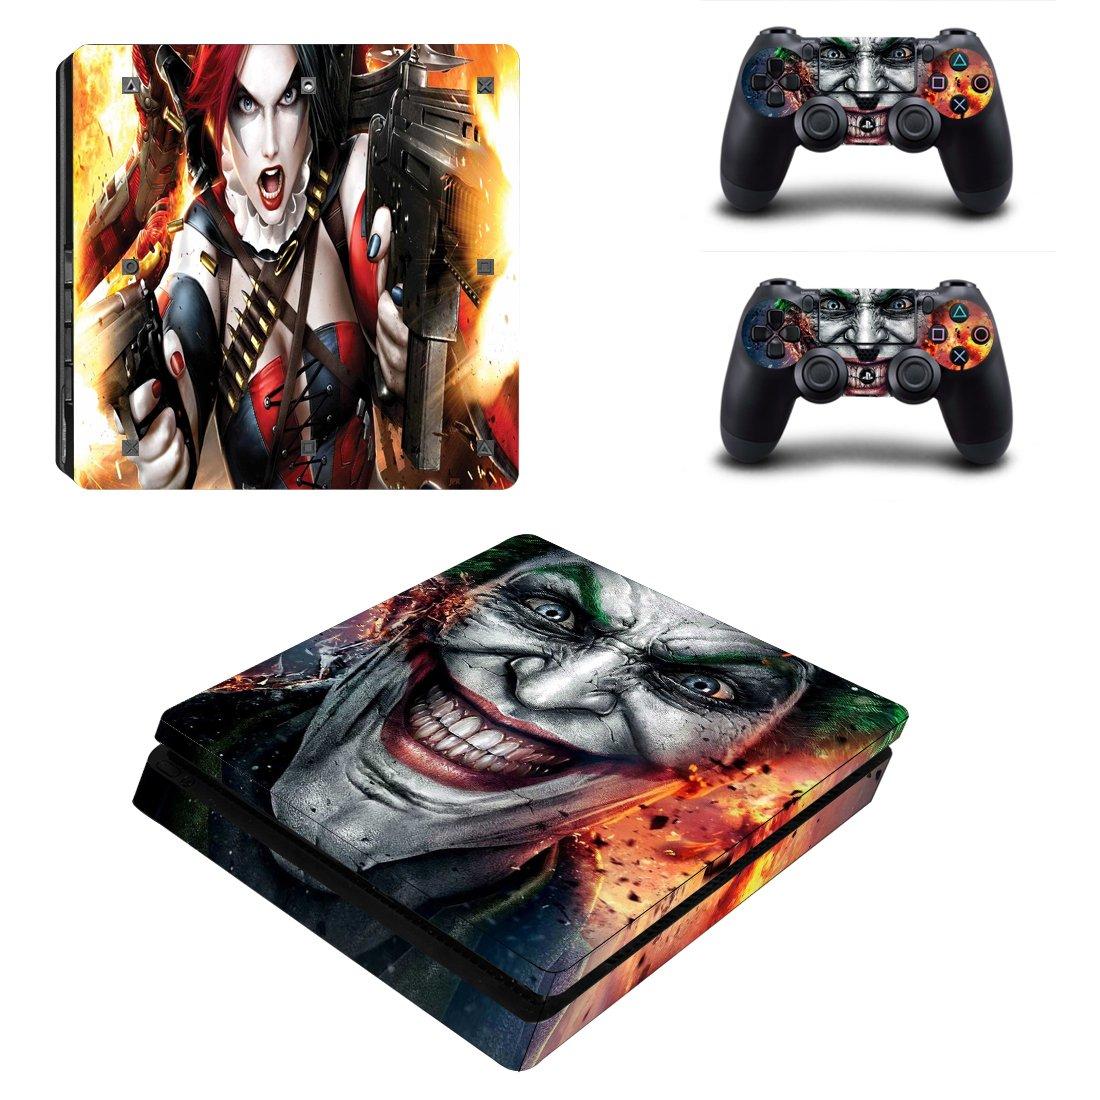 Adventure Games - PS4 SLIM - Harley Quinn and Joker - Playstation 4 Vinyl Console Skin Decal Sticker + 2 Controller Skins Set